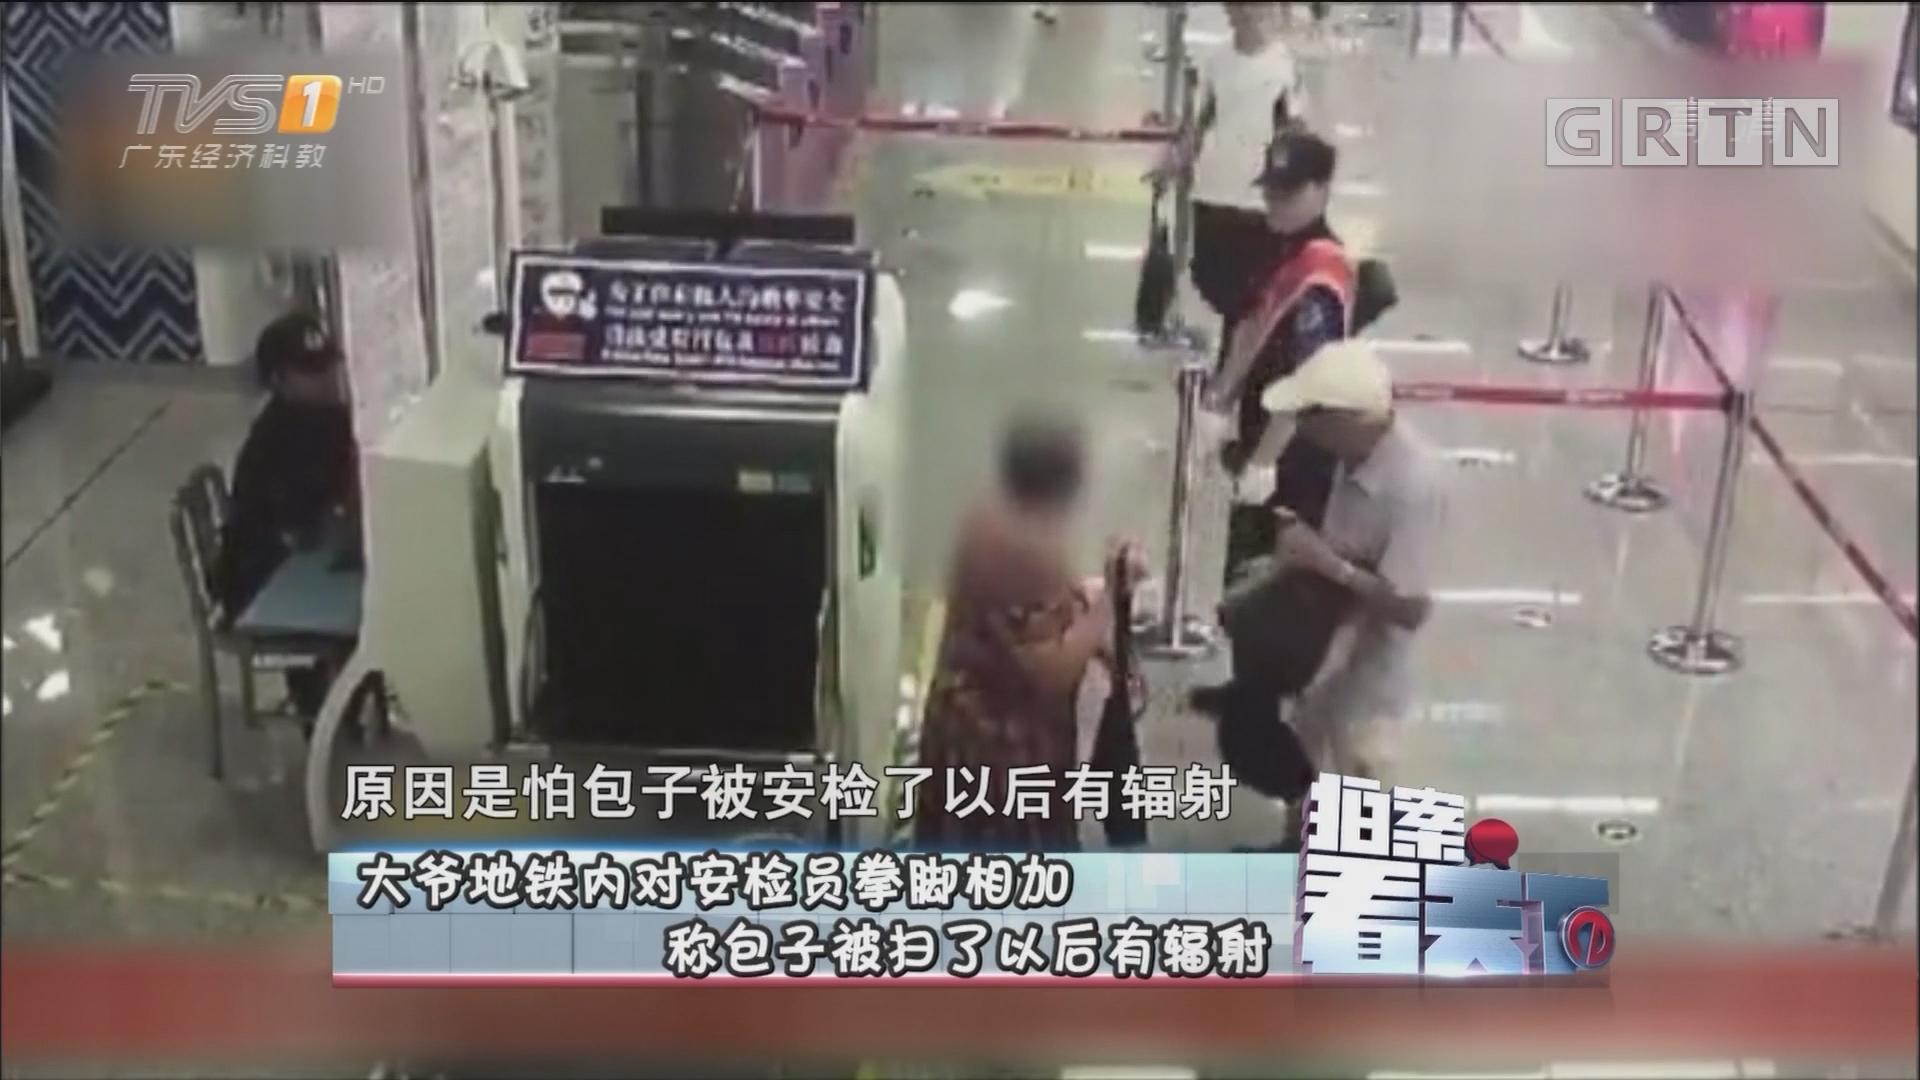 [HD][2017-07-07]拍案看天下:大爷地铁内对安检员拳脚相加 称包子被扫了以后有辐射